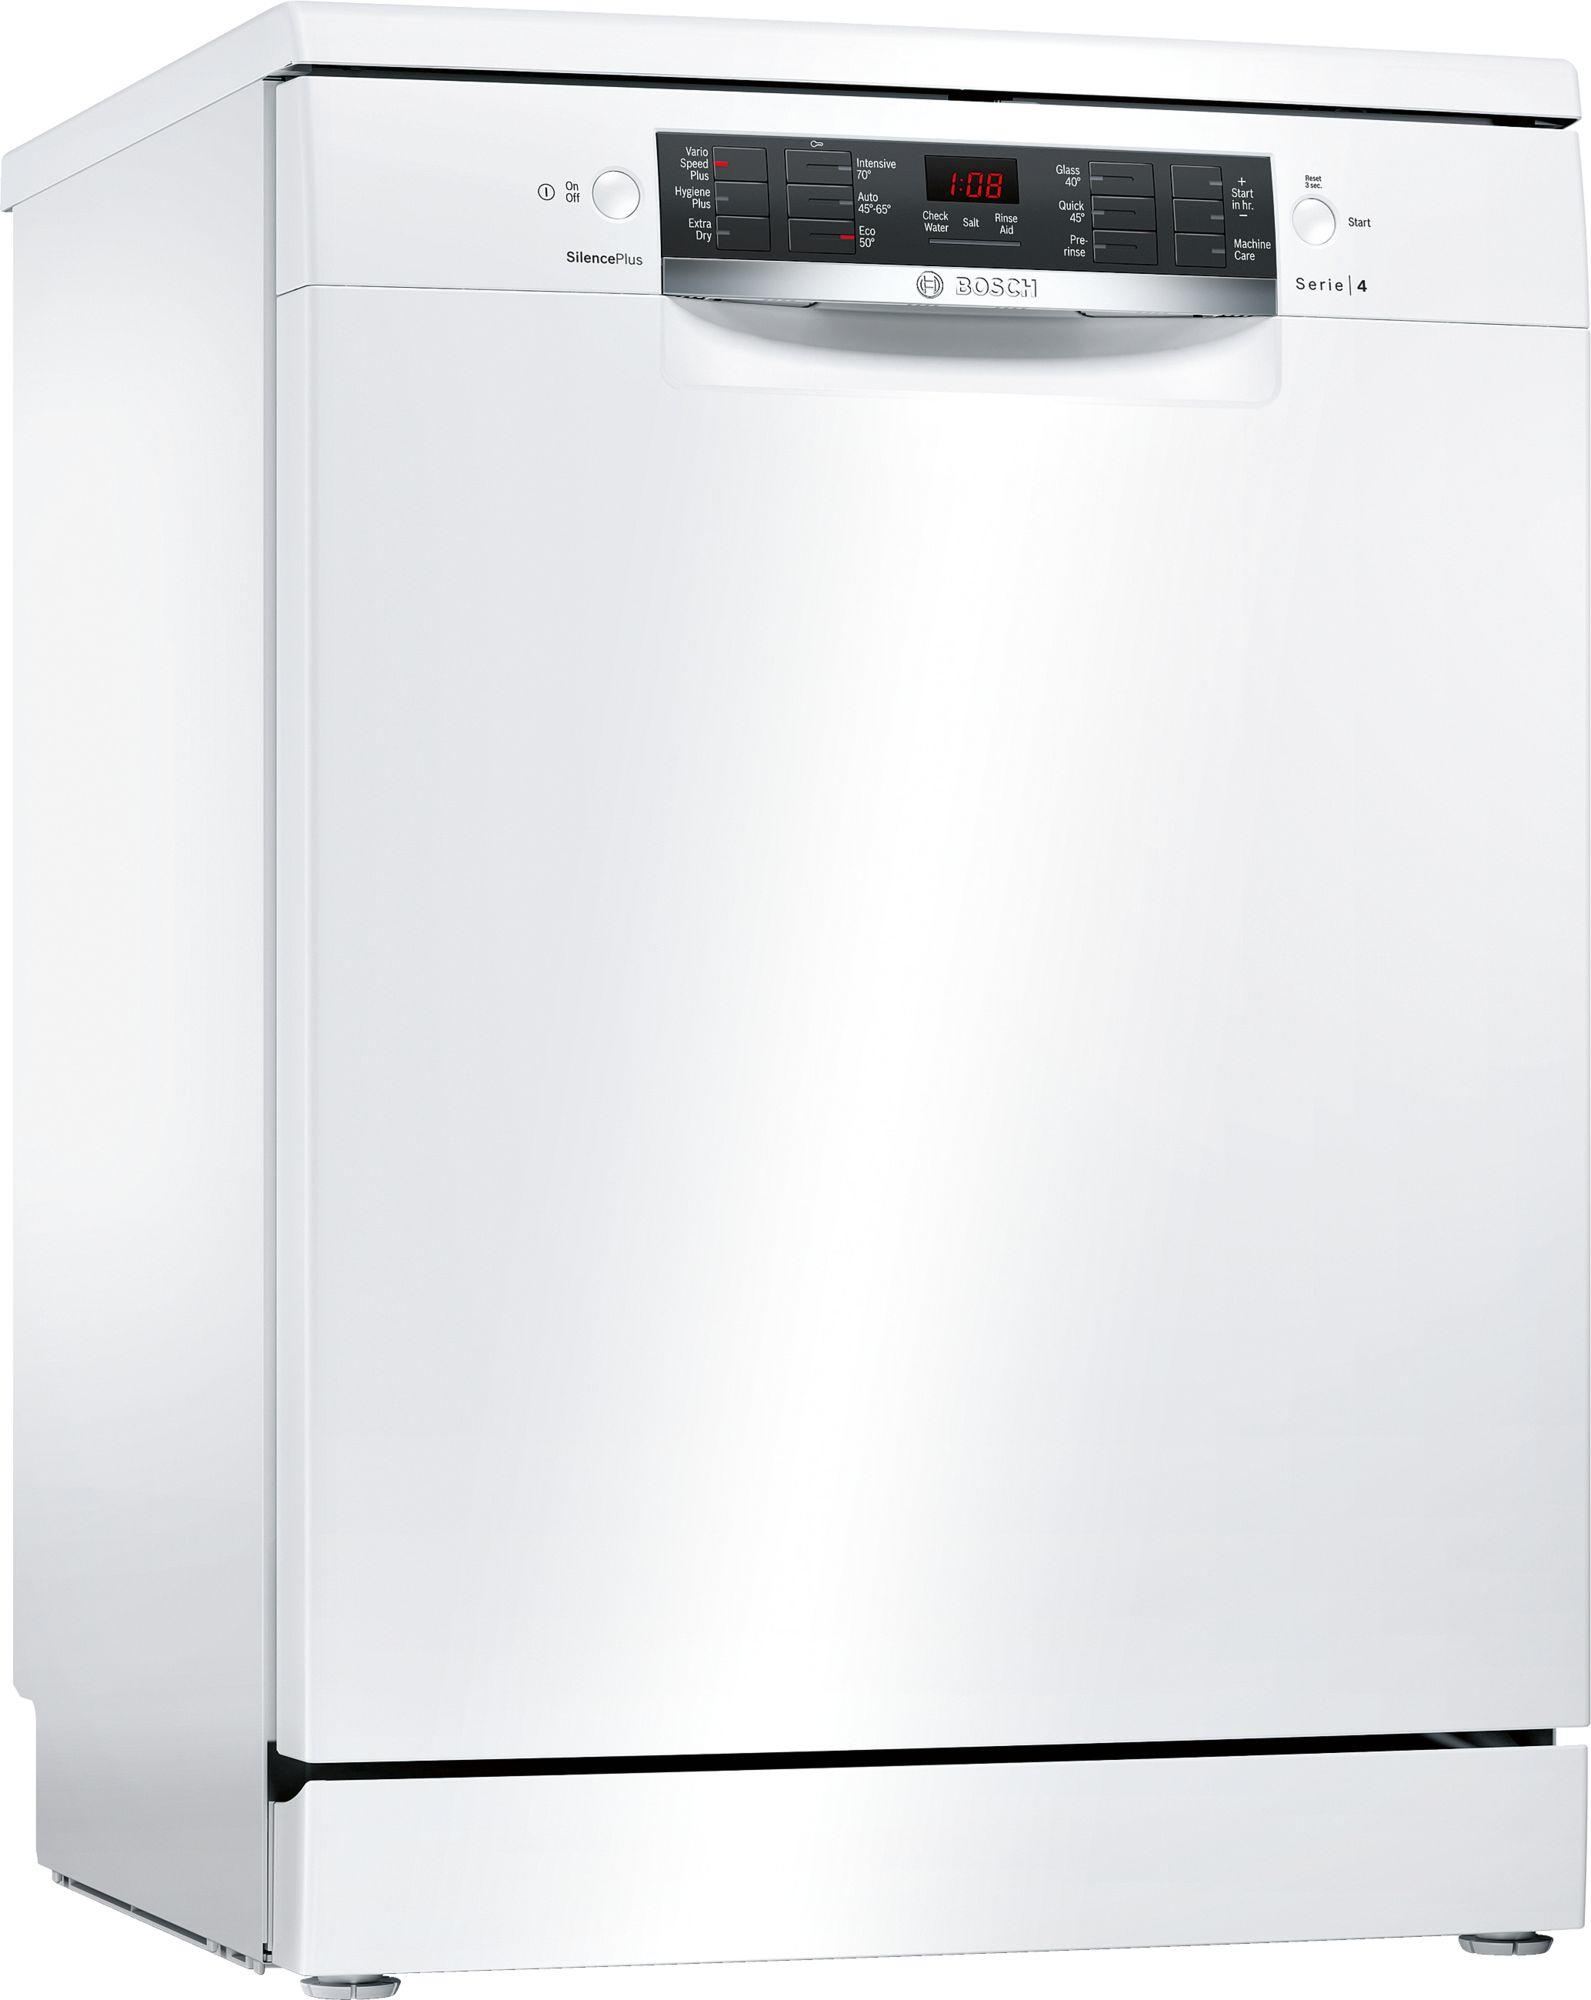 Image of Serie 4 SMS46JW09G 60cm A++ Standard Dishwasher | White